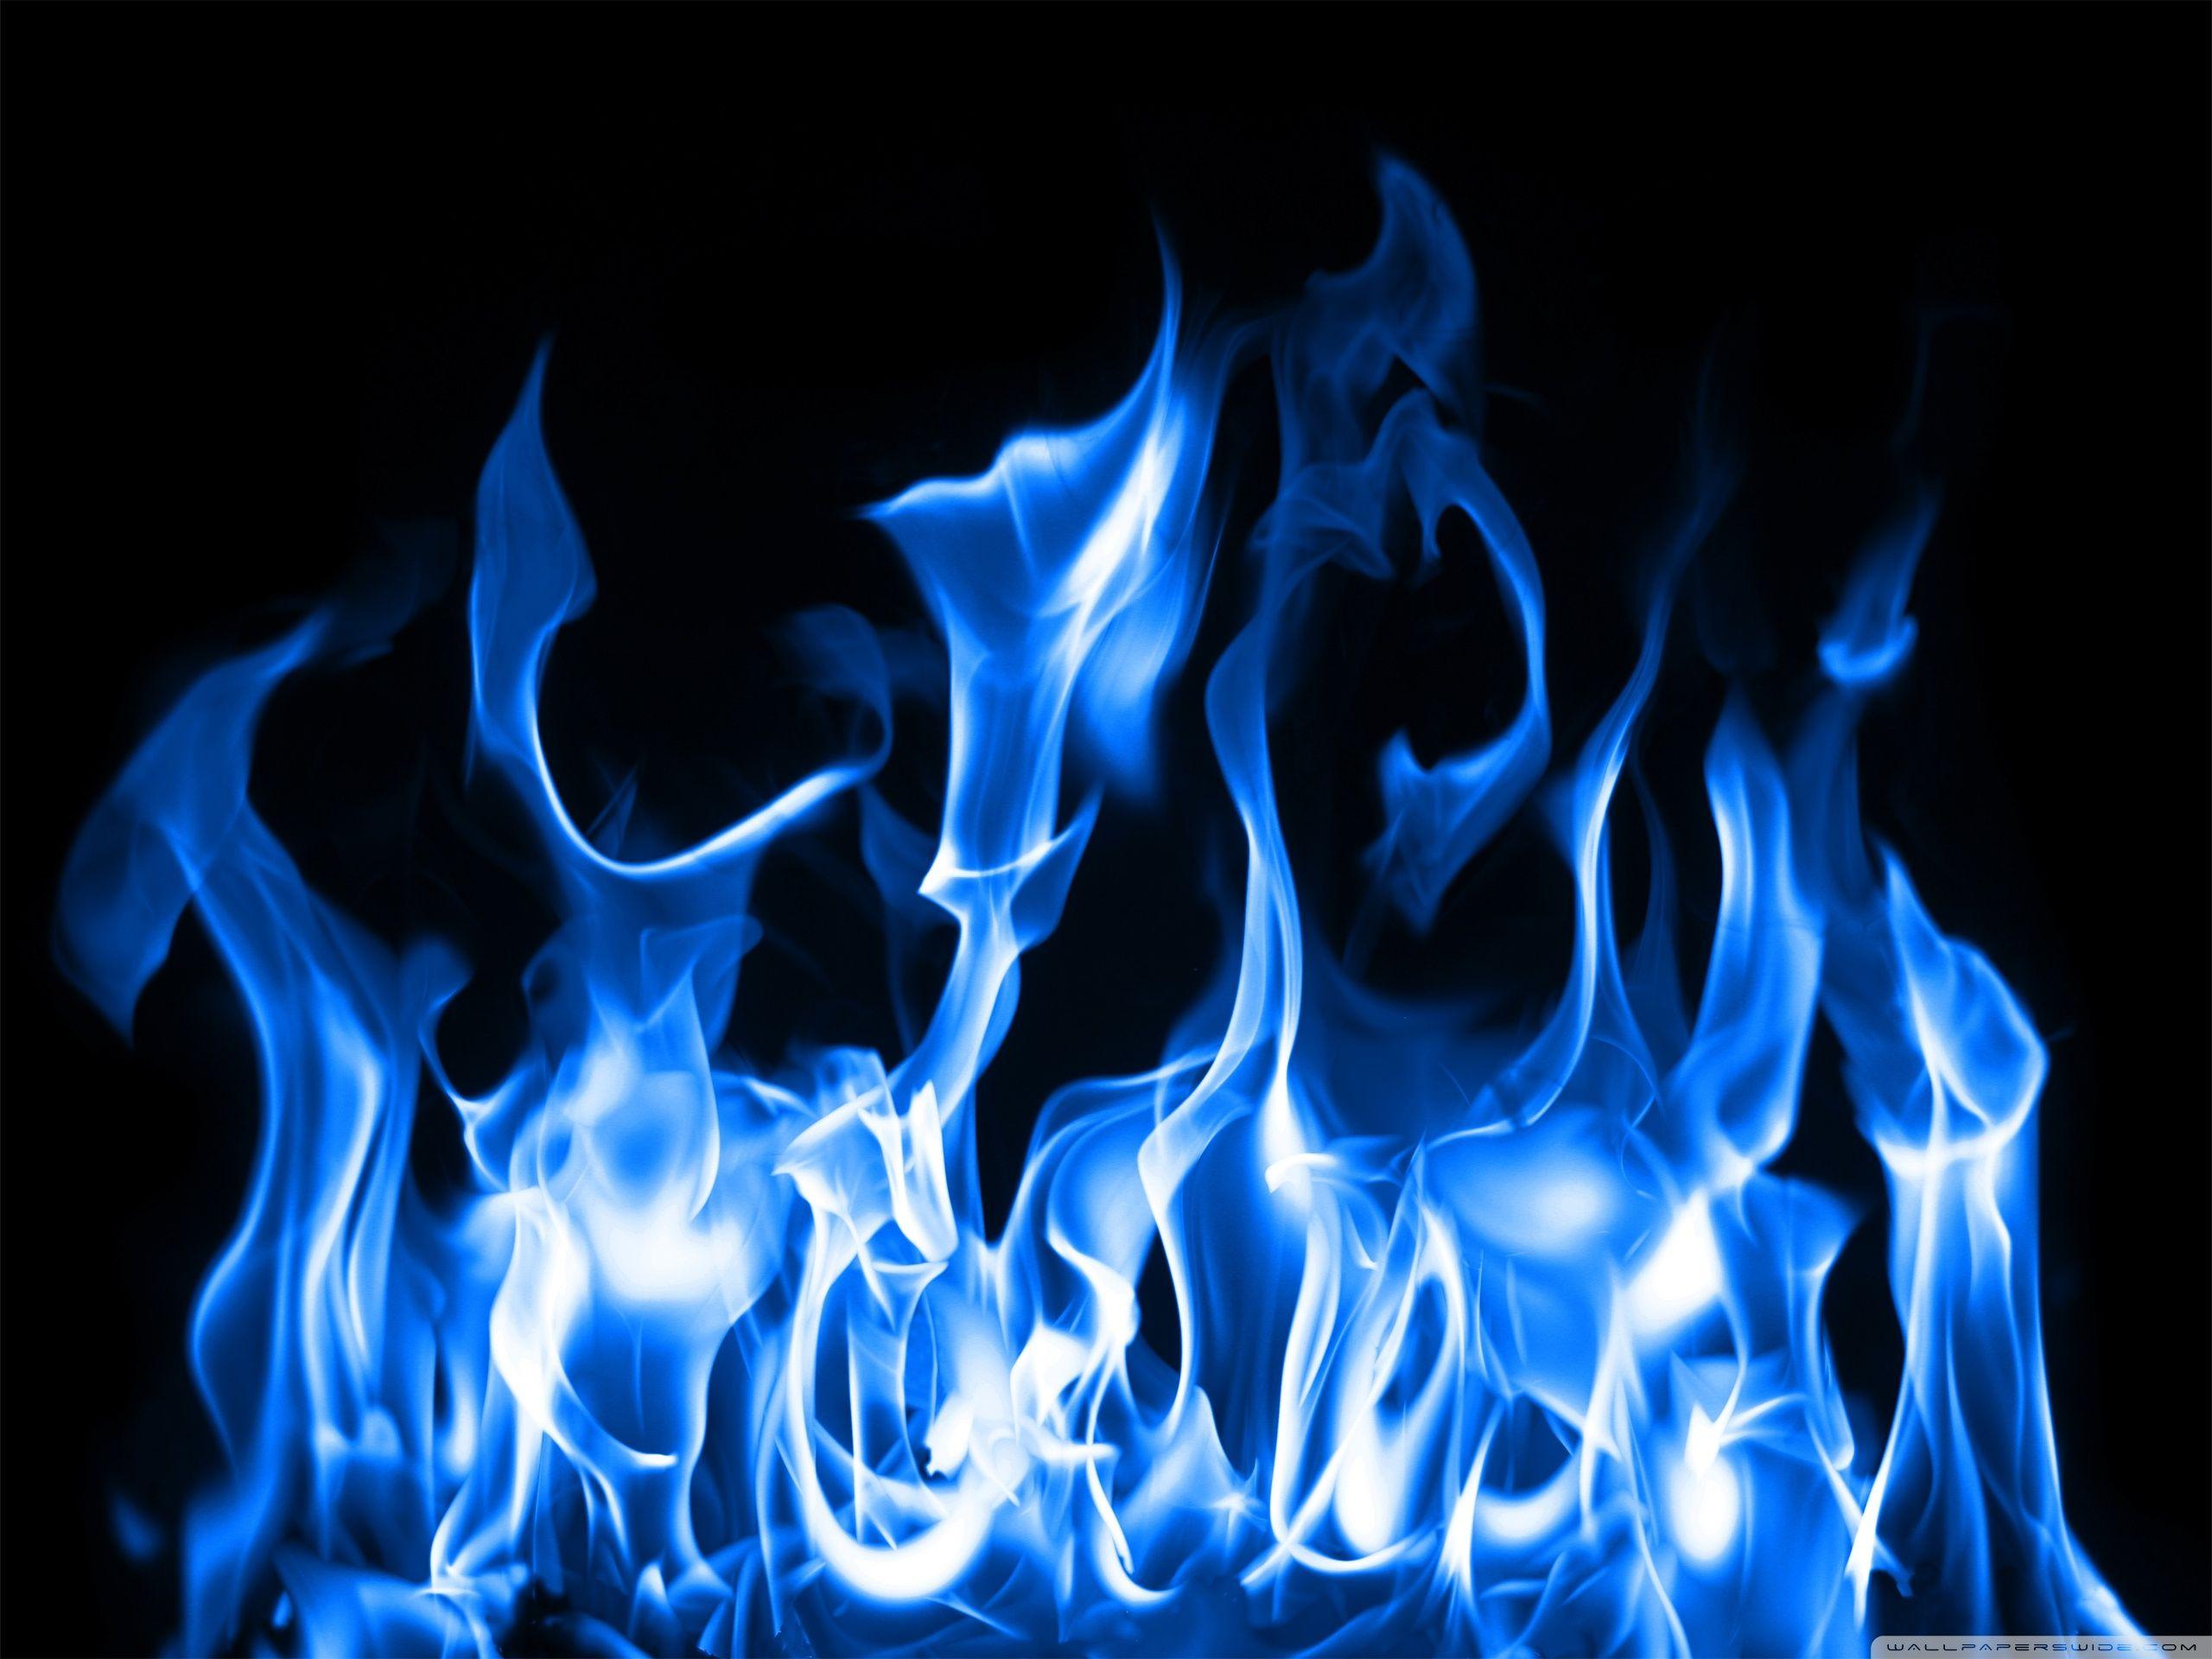 blue fire hd desktop wallpaper : high definition : mobile | images